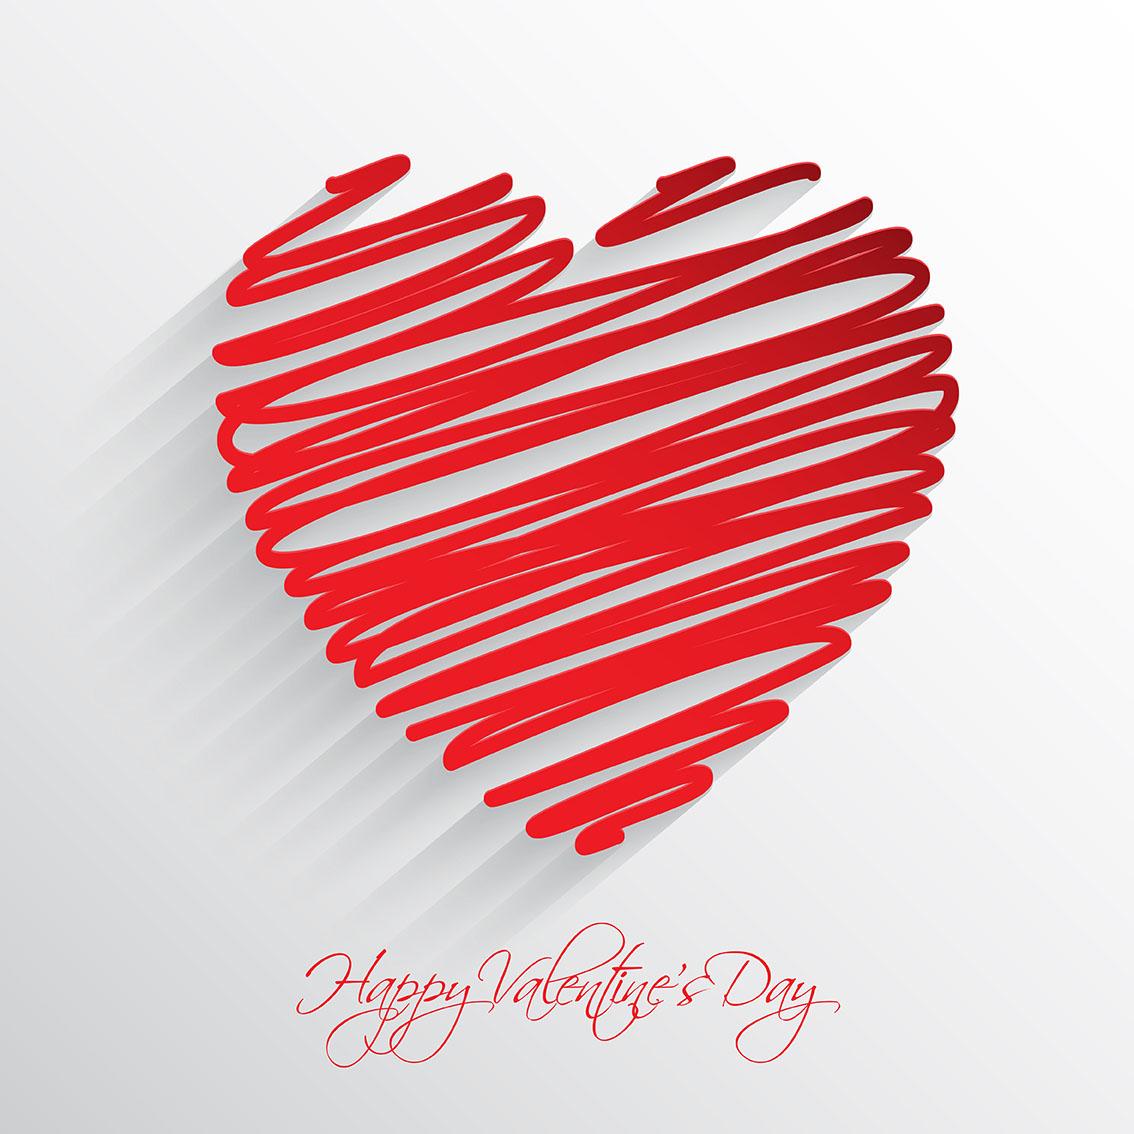 Scribble heart background - Download Free Vectors, Clipart ...